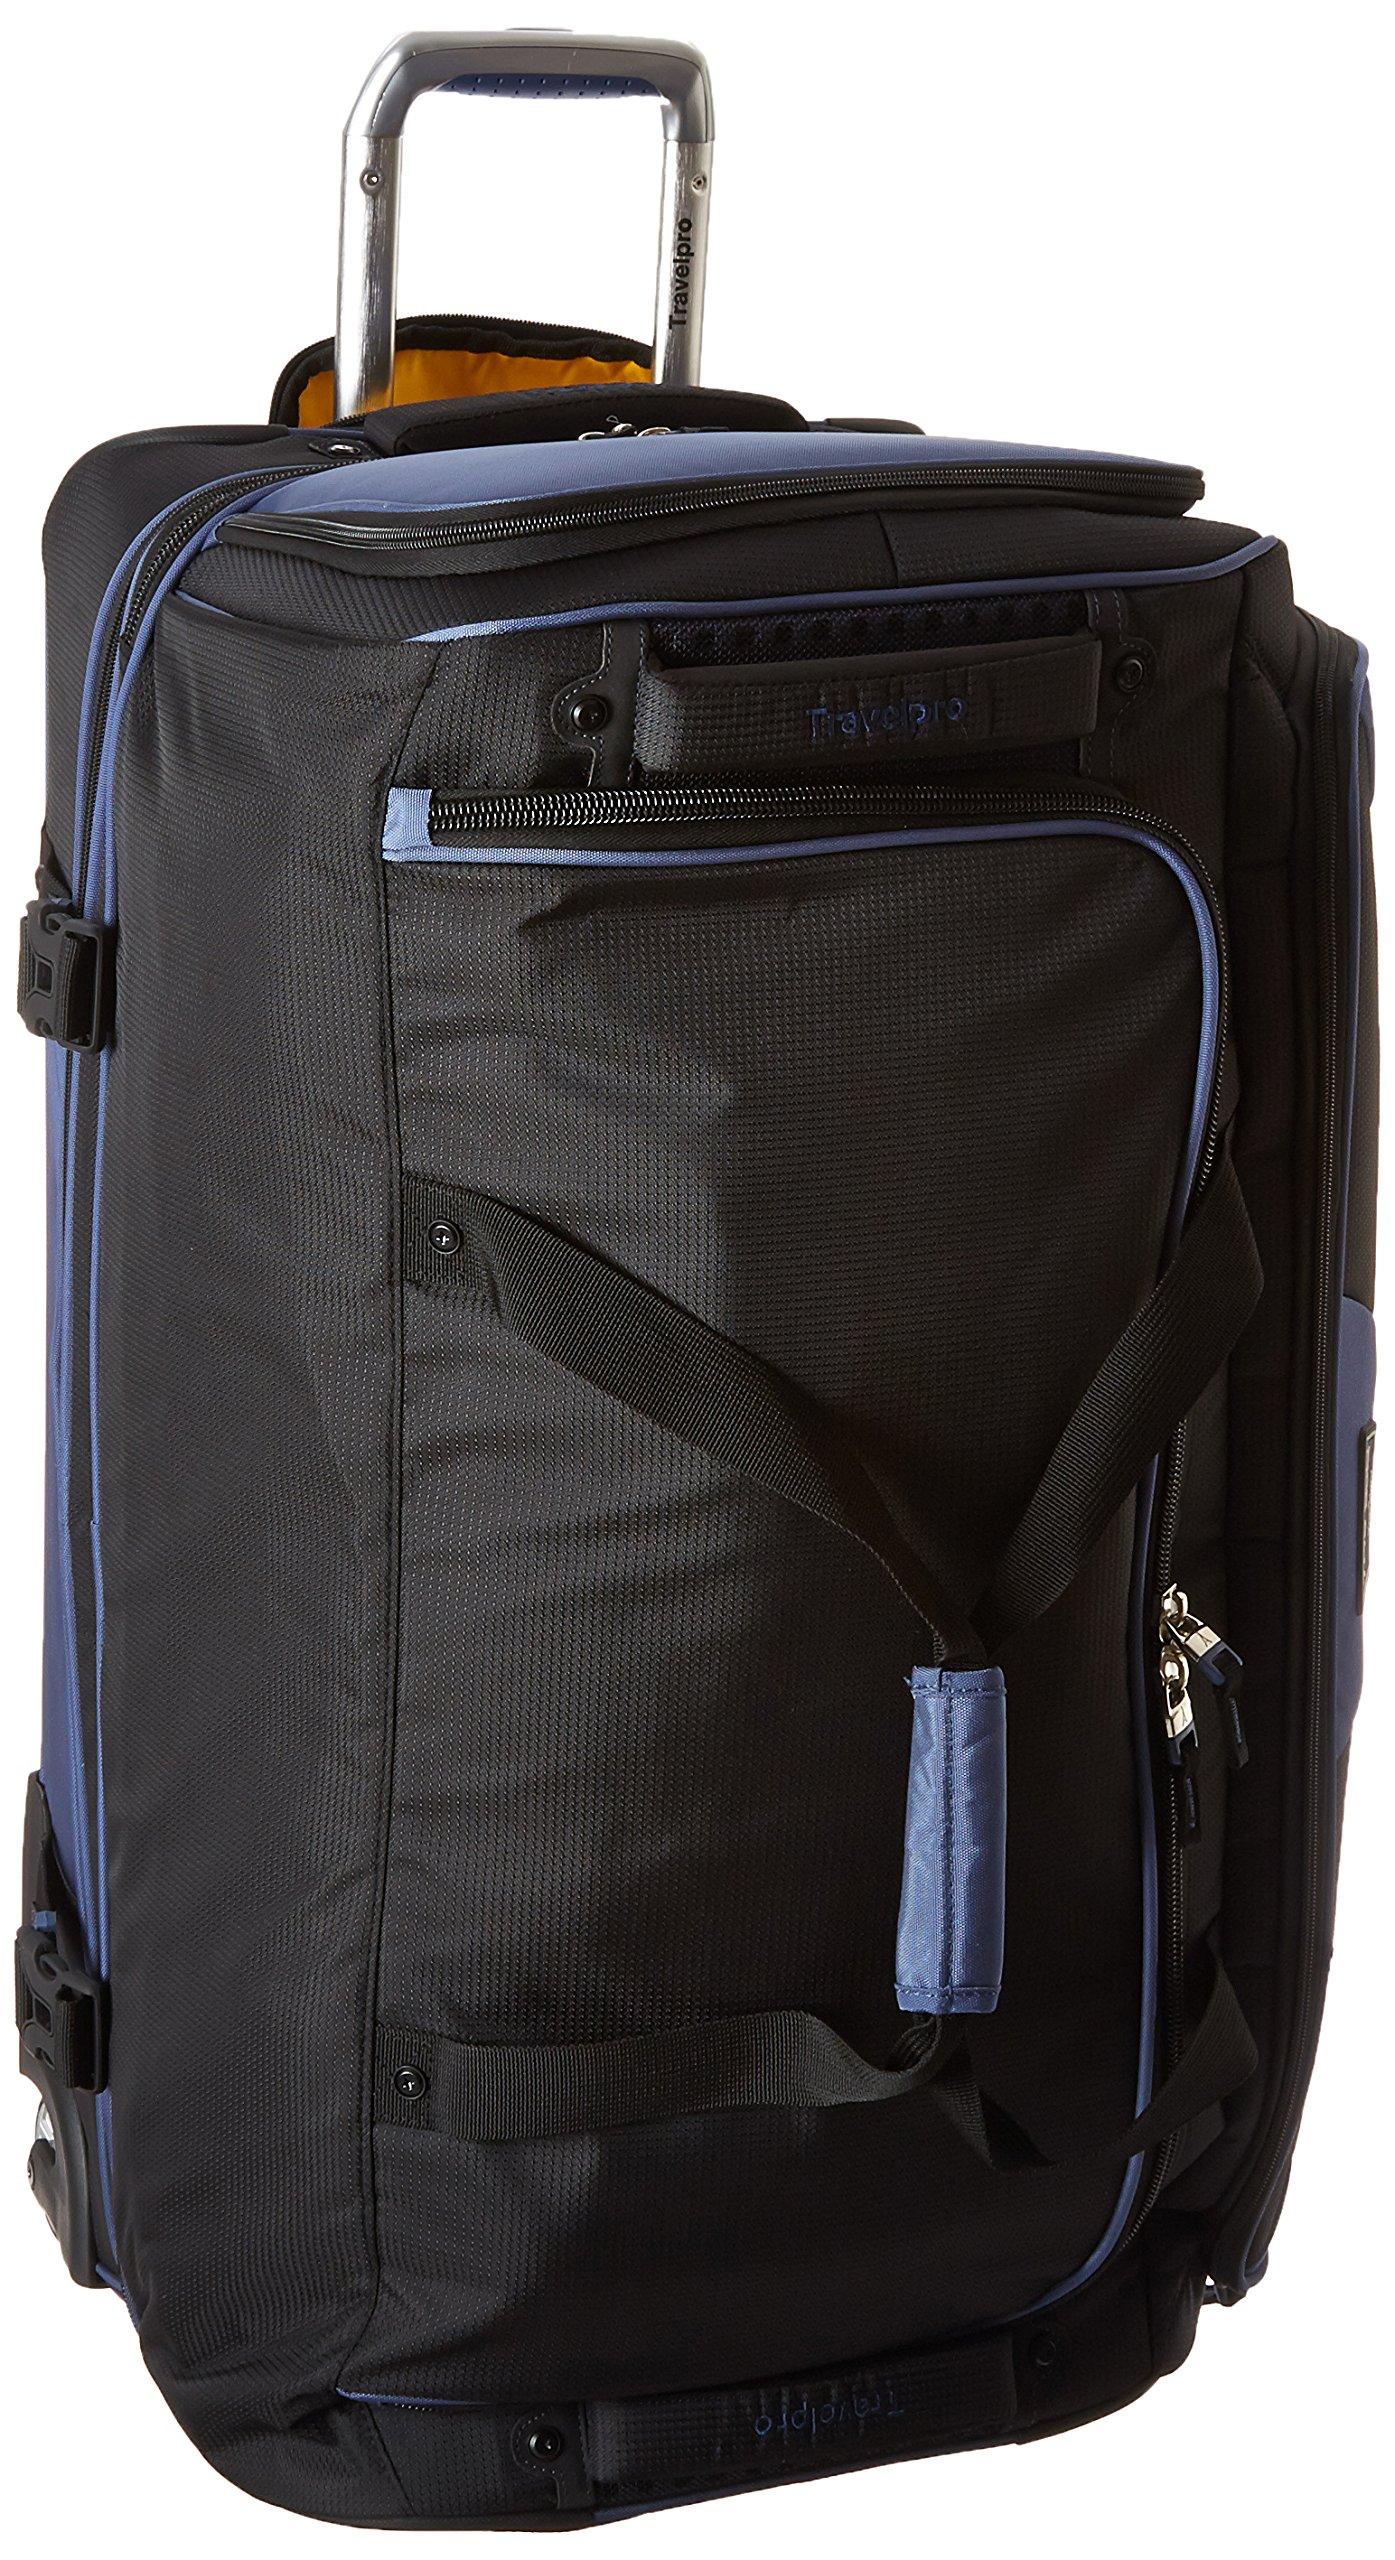 Travelpro Tpro Bold 2.0 30 Inch Drop Bottom Rolling Duffel, Black/Navy, One Size